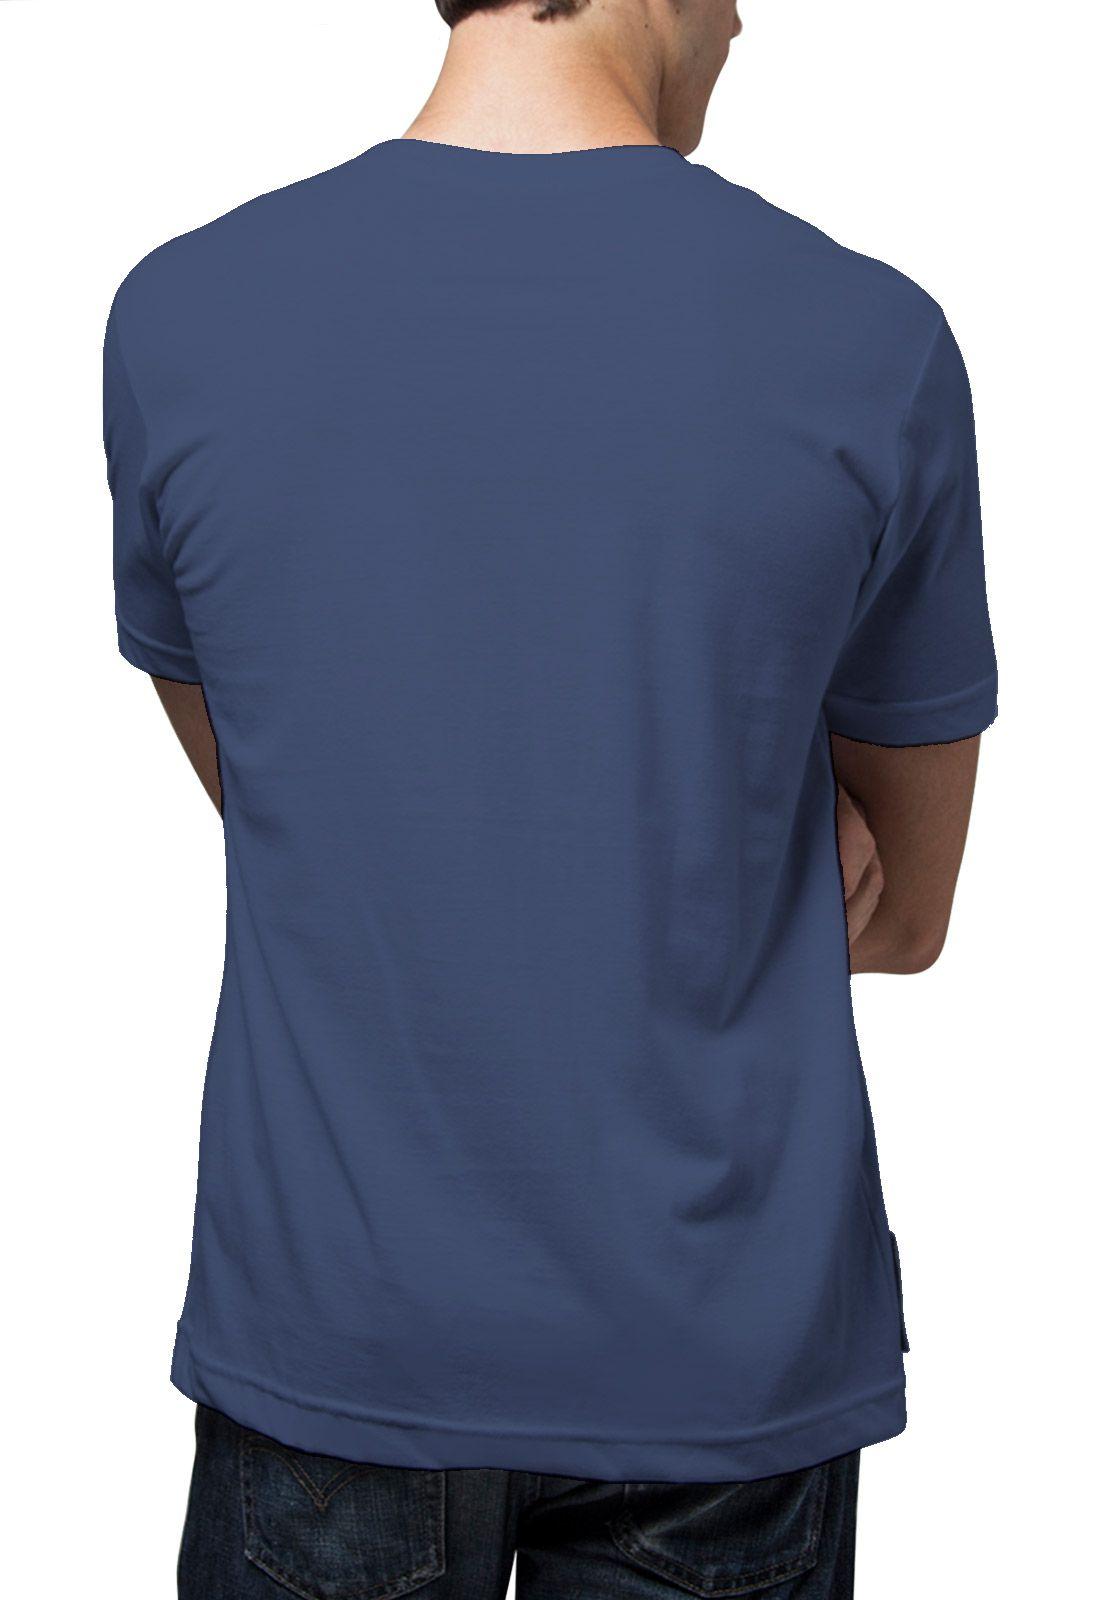 Camiseta Amazônia Lobo - Azul